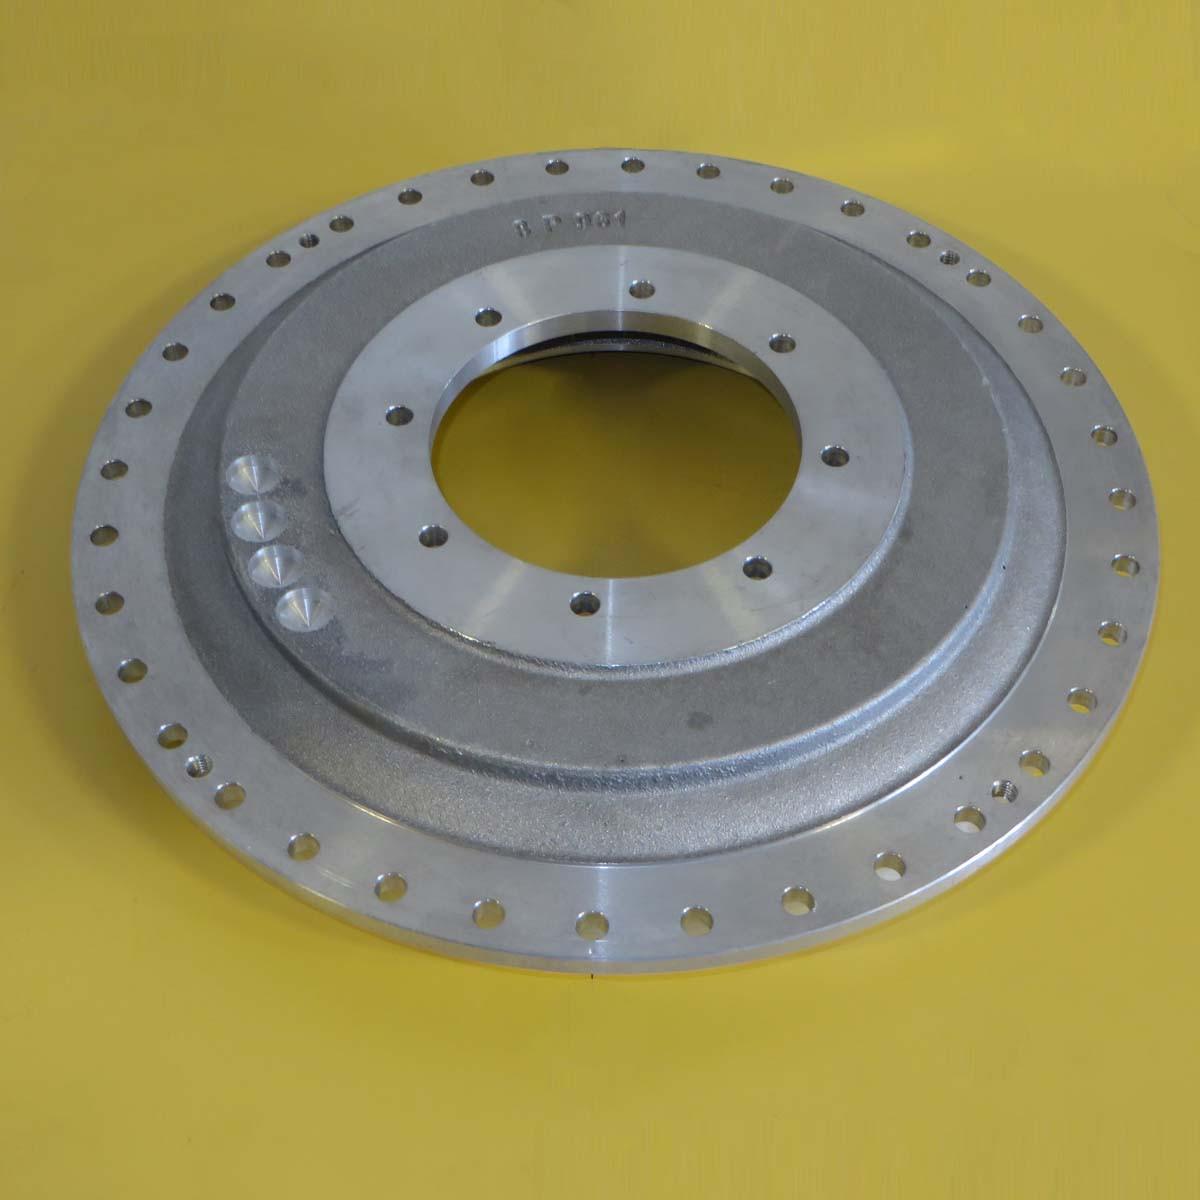 Torque Converter Impeller : P impeller torque converter amt equipment parts